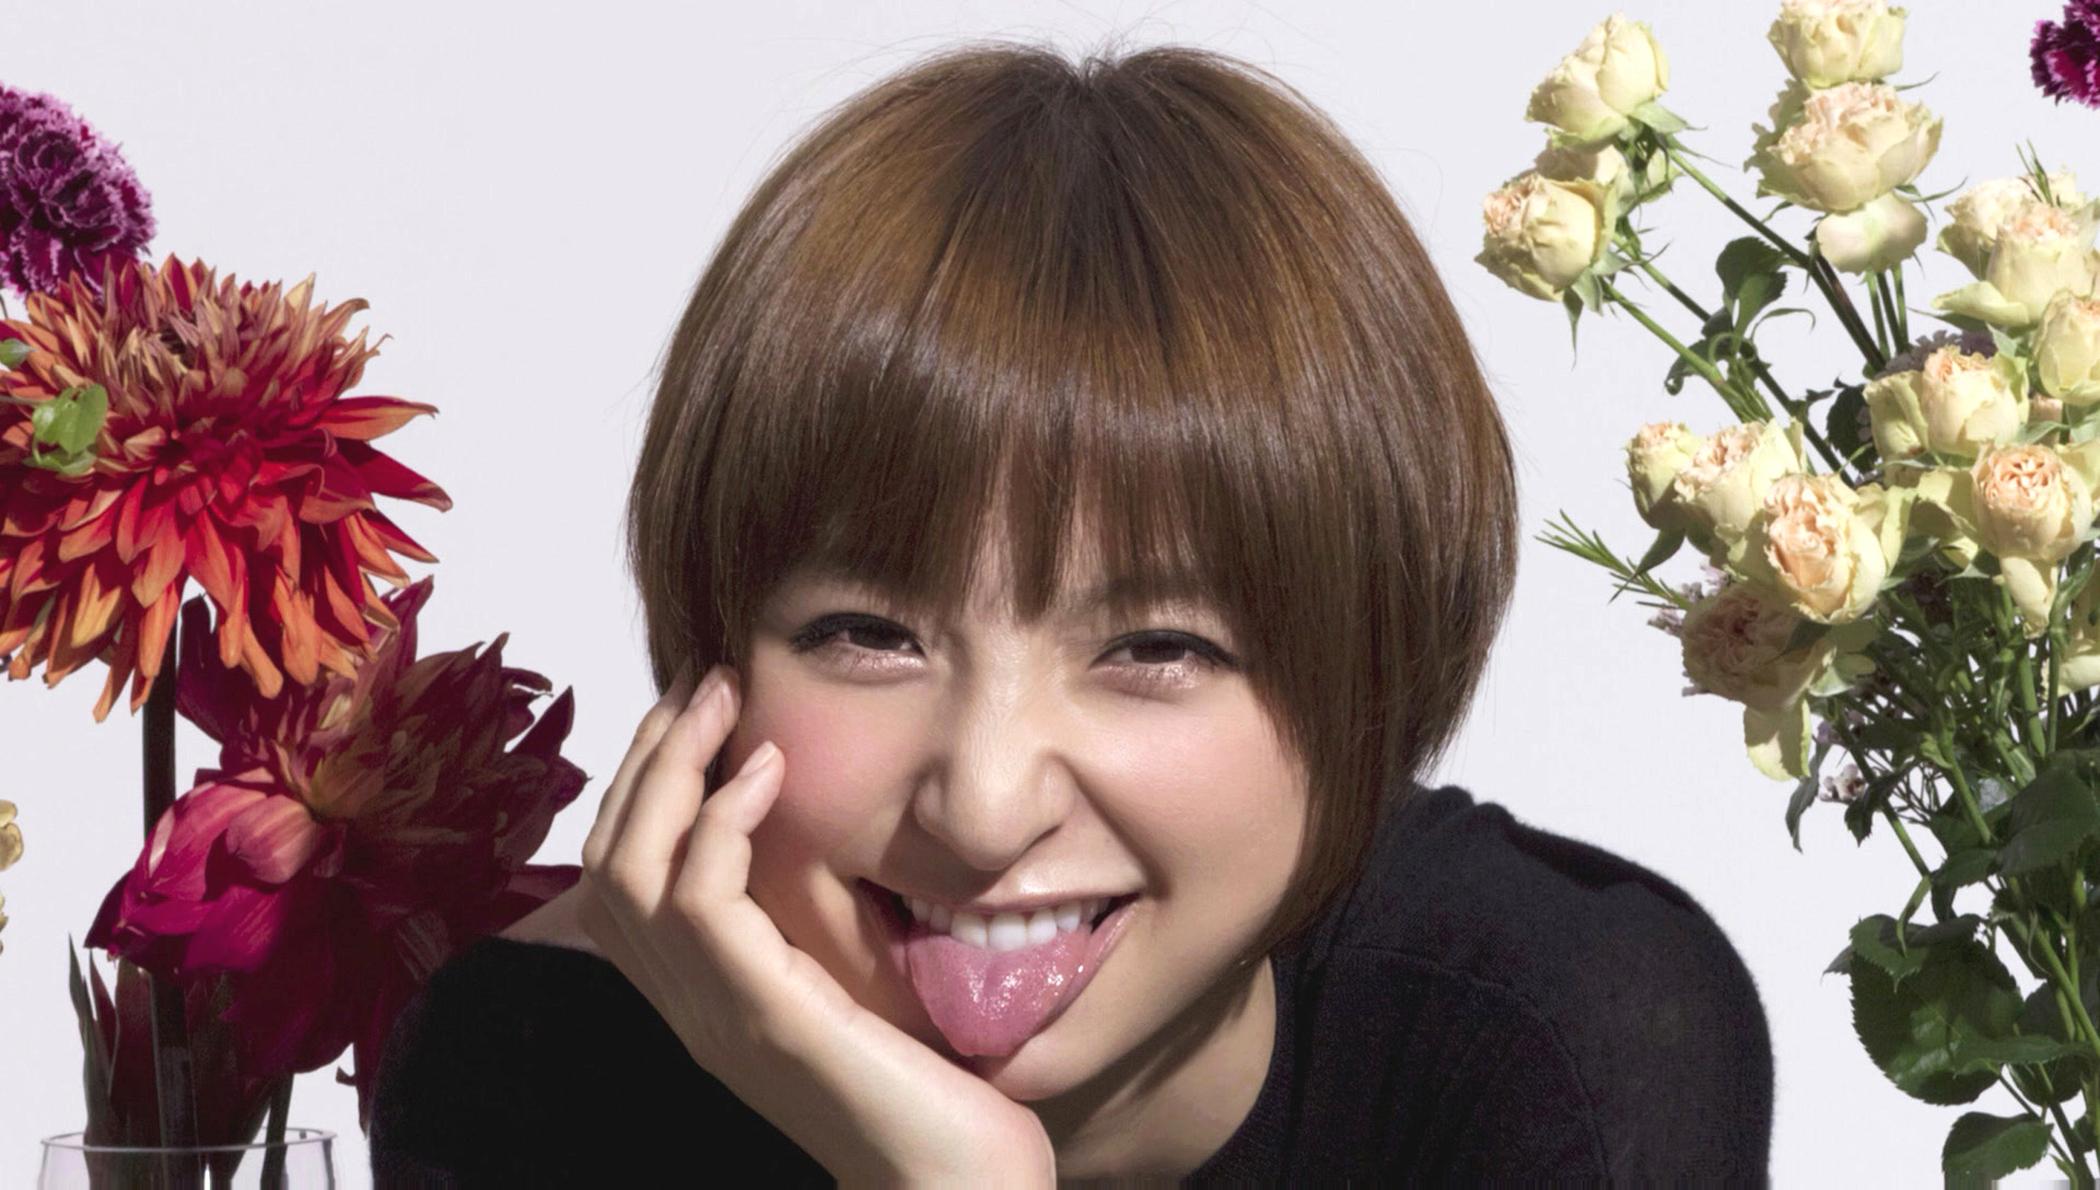 http://livedoor.4.blogimg.jp/adult_pics/imgs/e/3/e3168e23.jpg